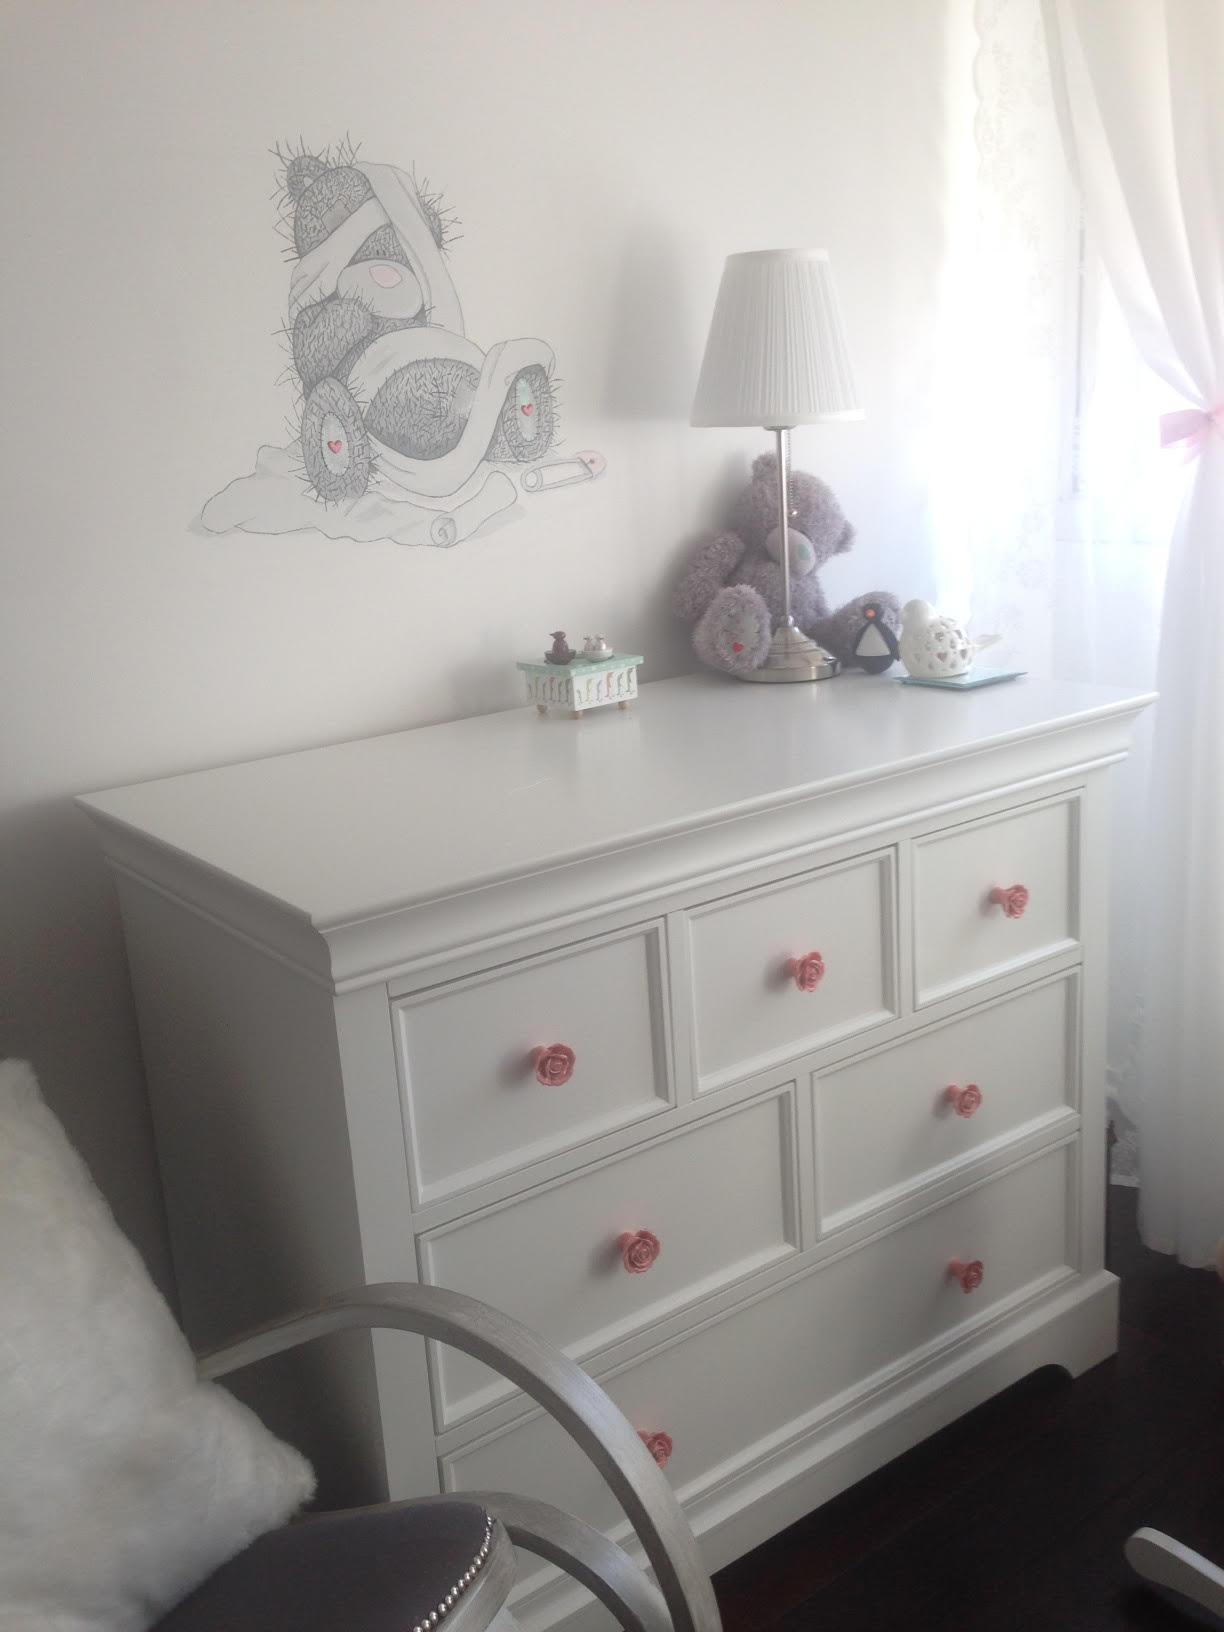 Découvrez la chambre bébé mel de soraya !